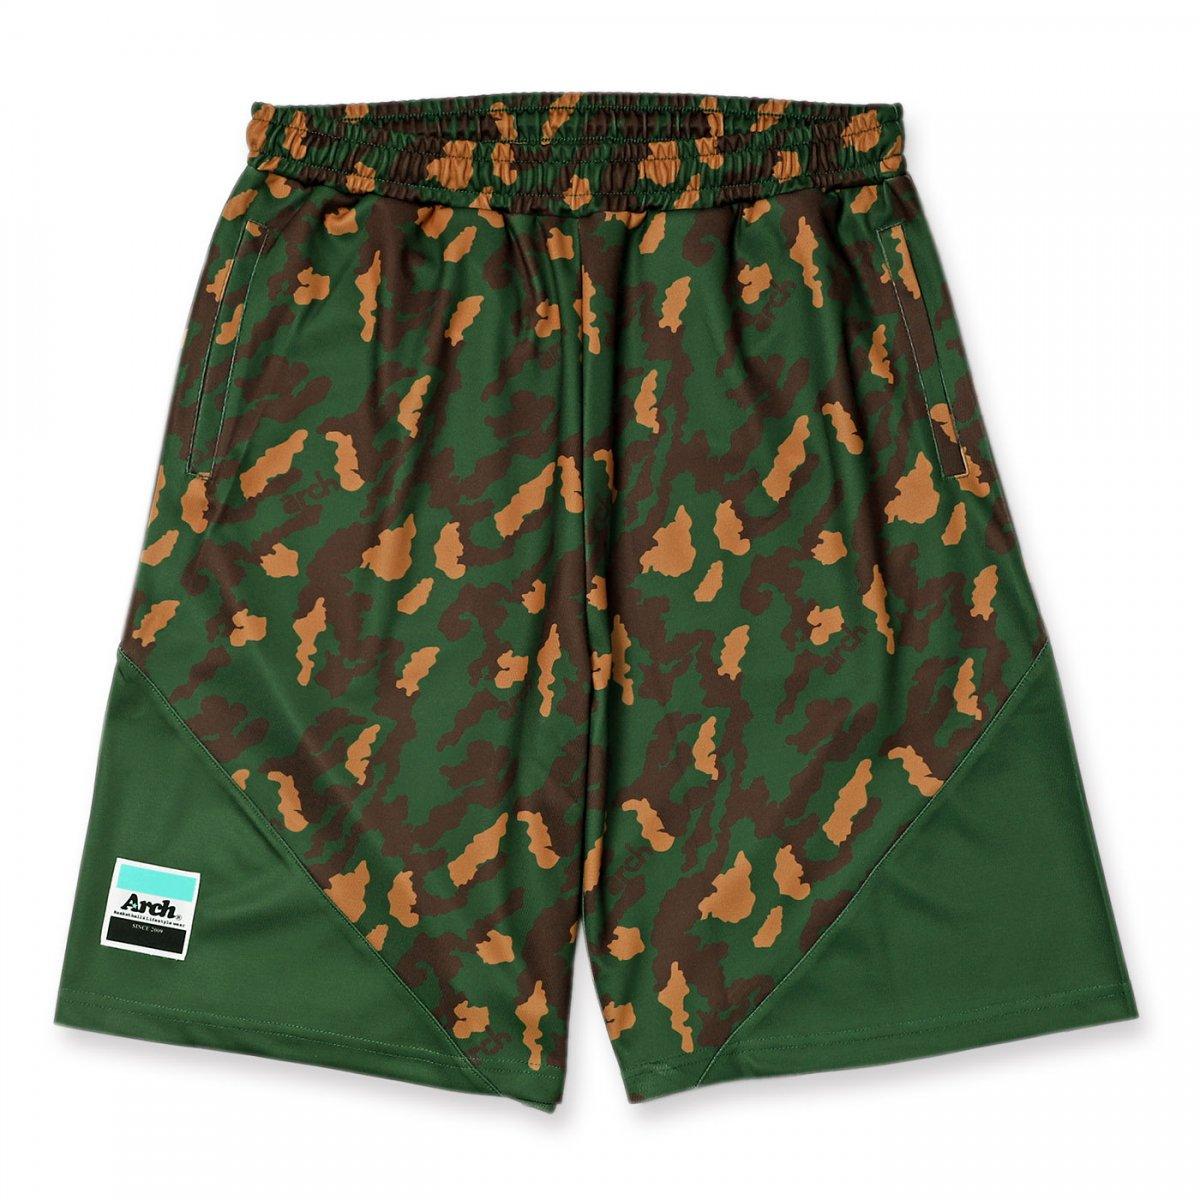 flex camo shorts【khaki】